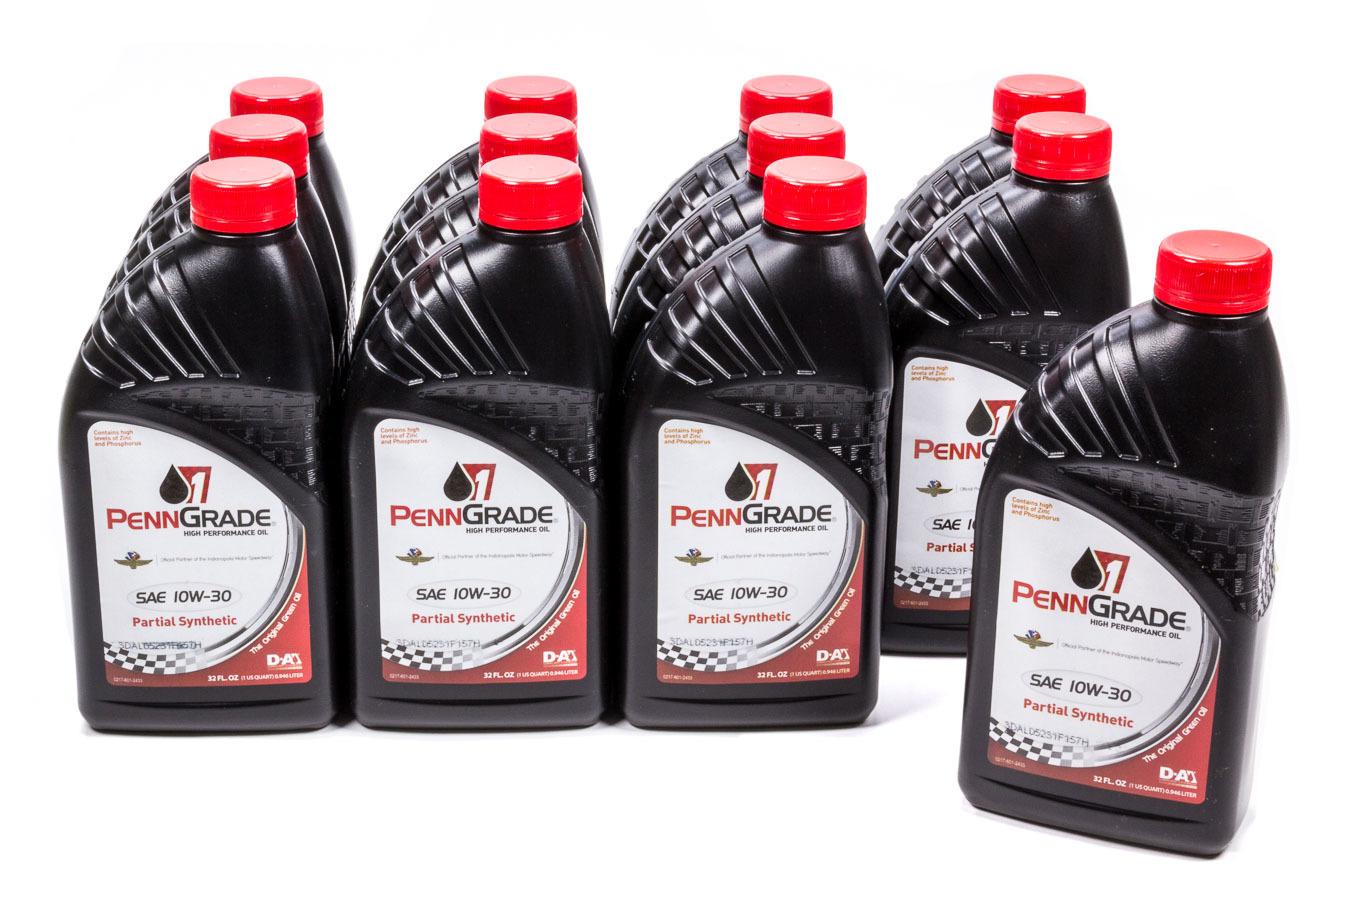 Penngrade Motor Oil 10w30 Racing Oil Cs/12Qt Partial Synthetic